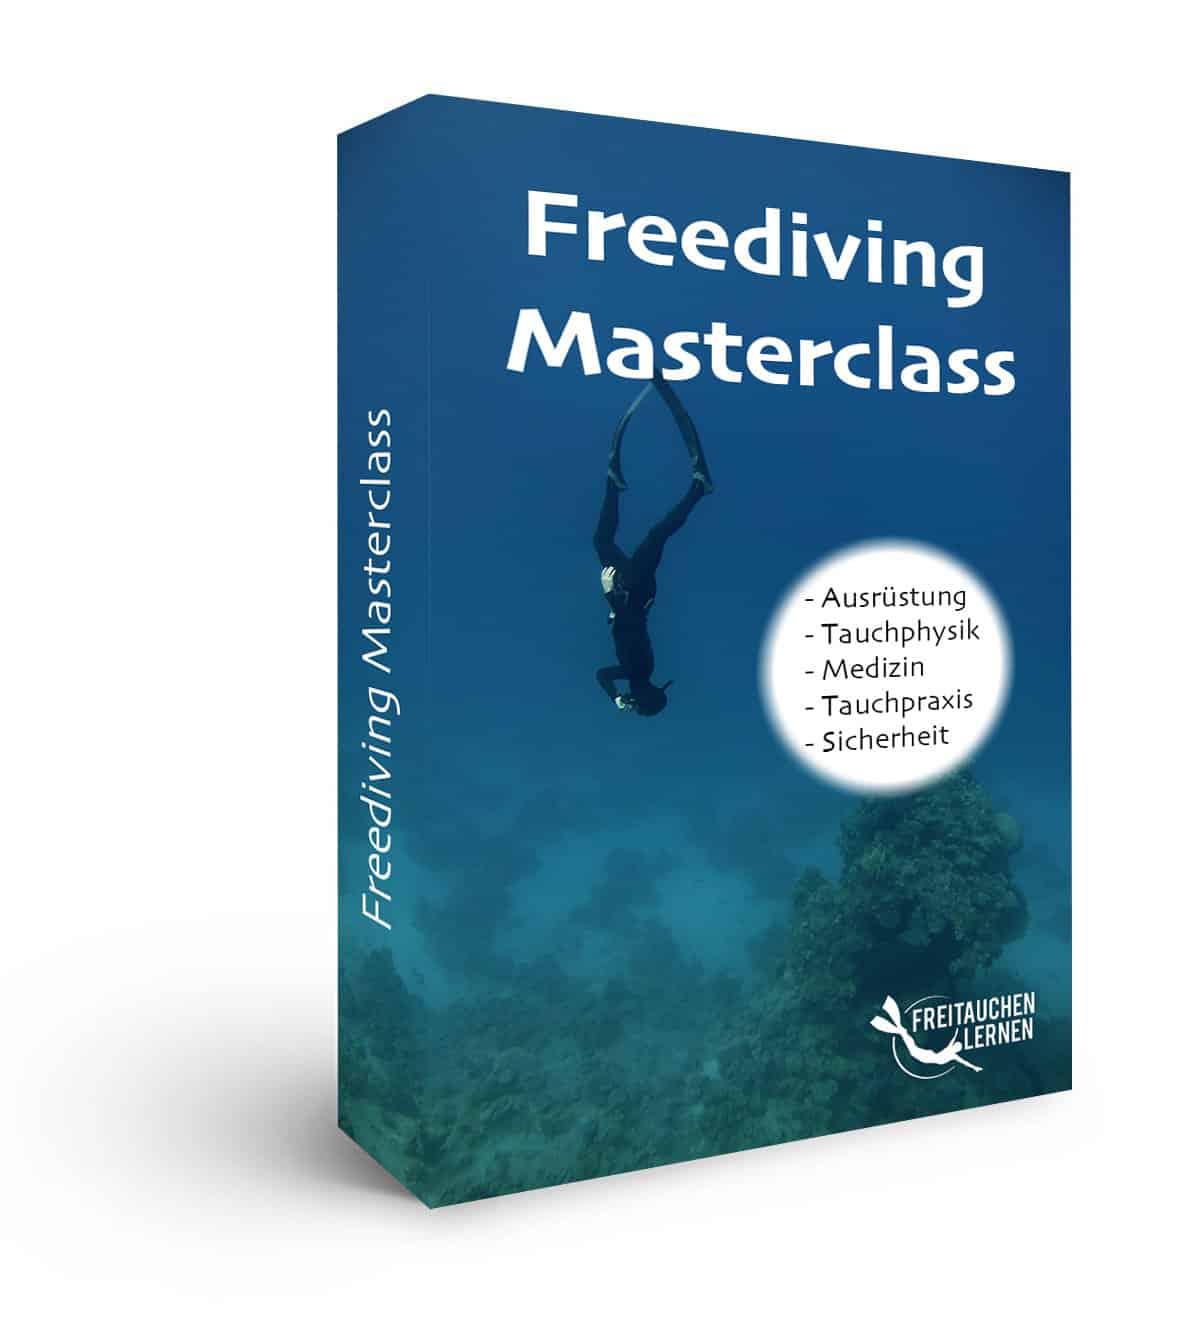 Freediving Masterclass